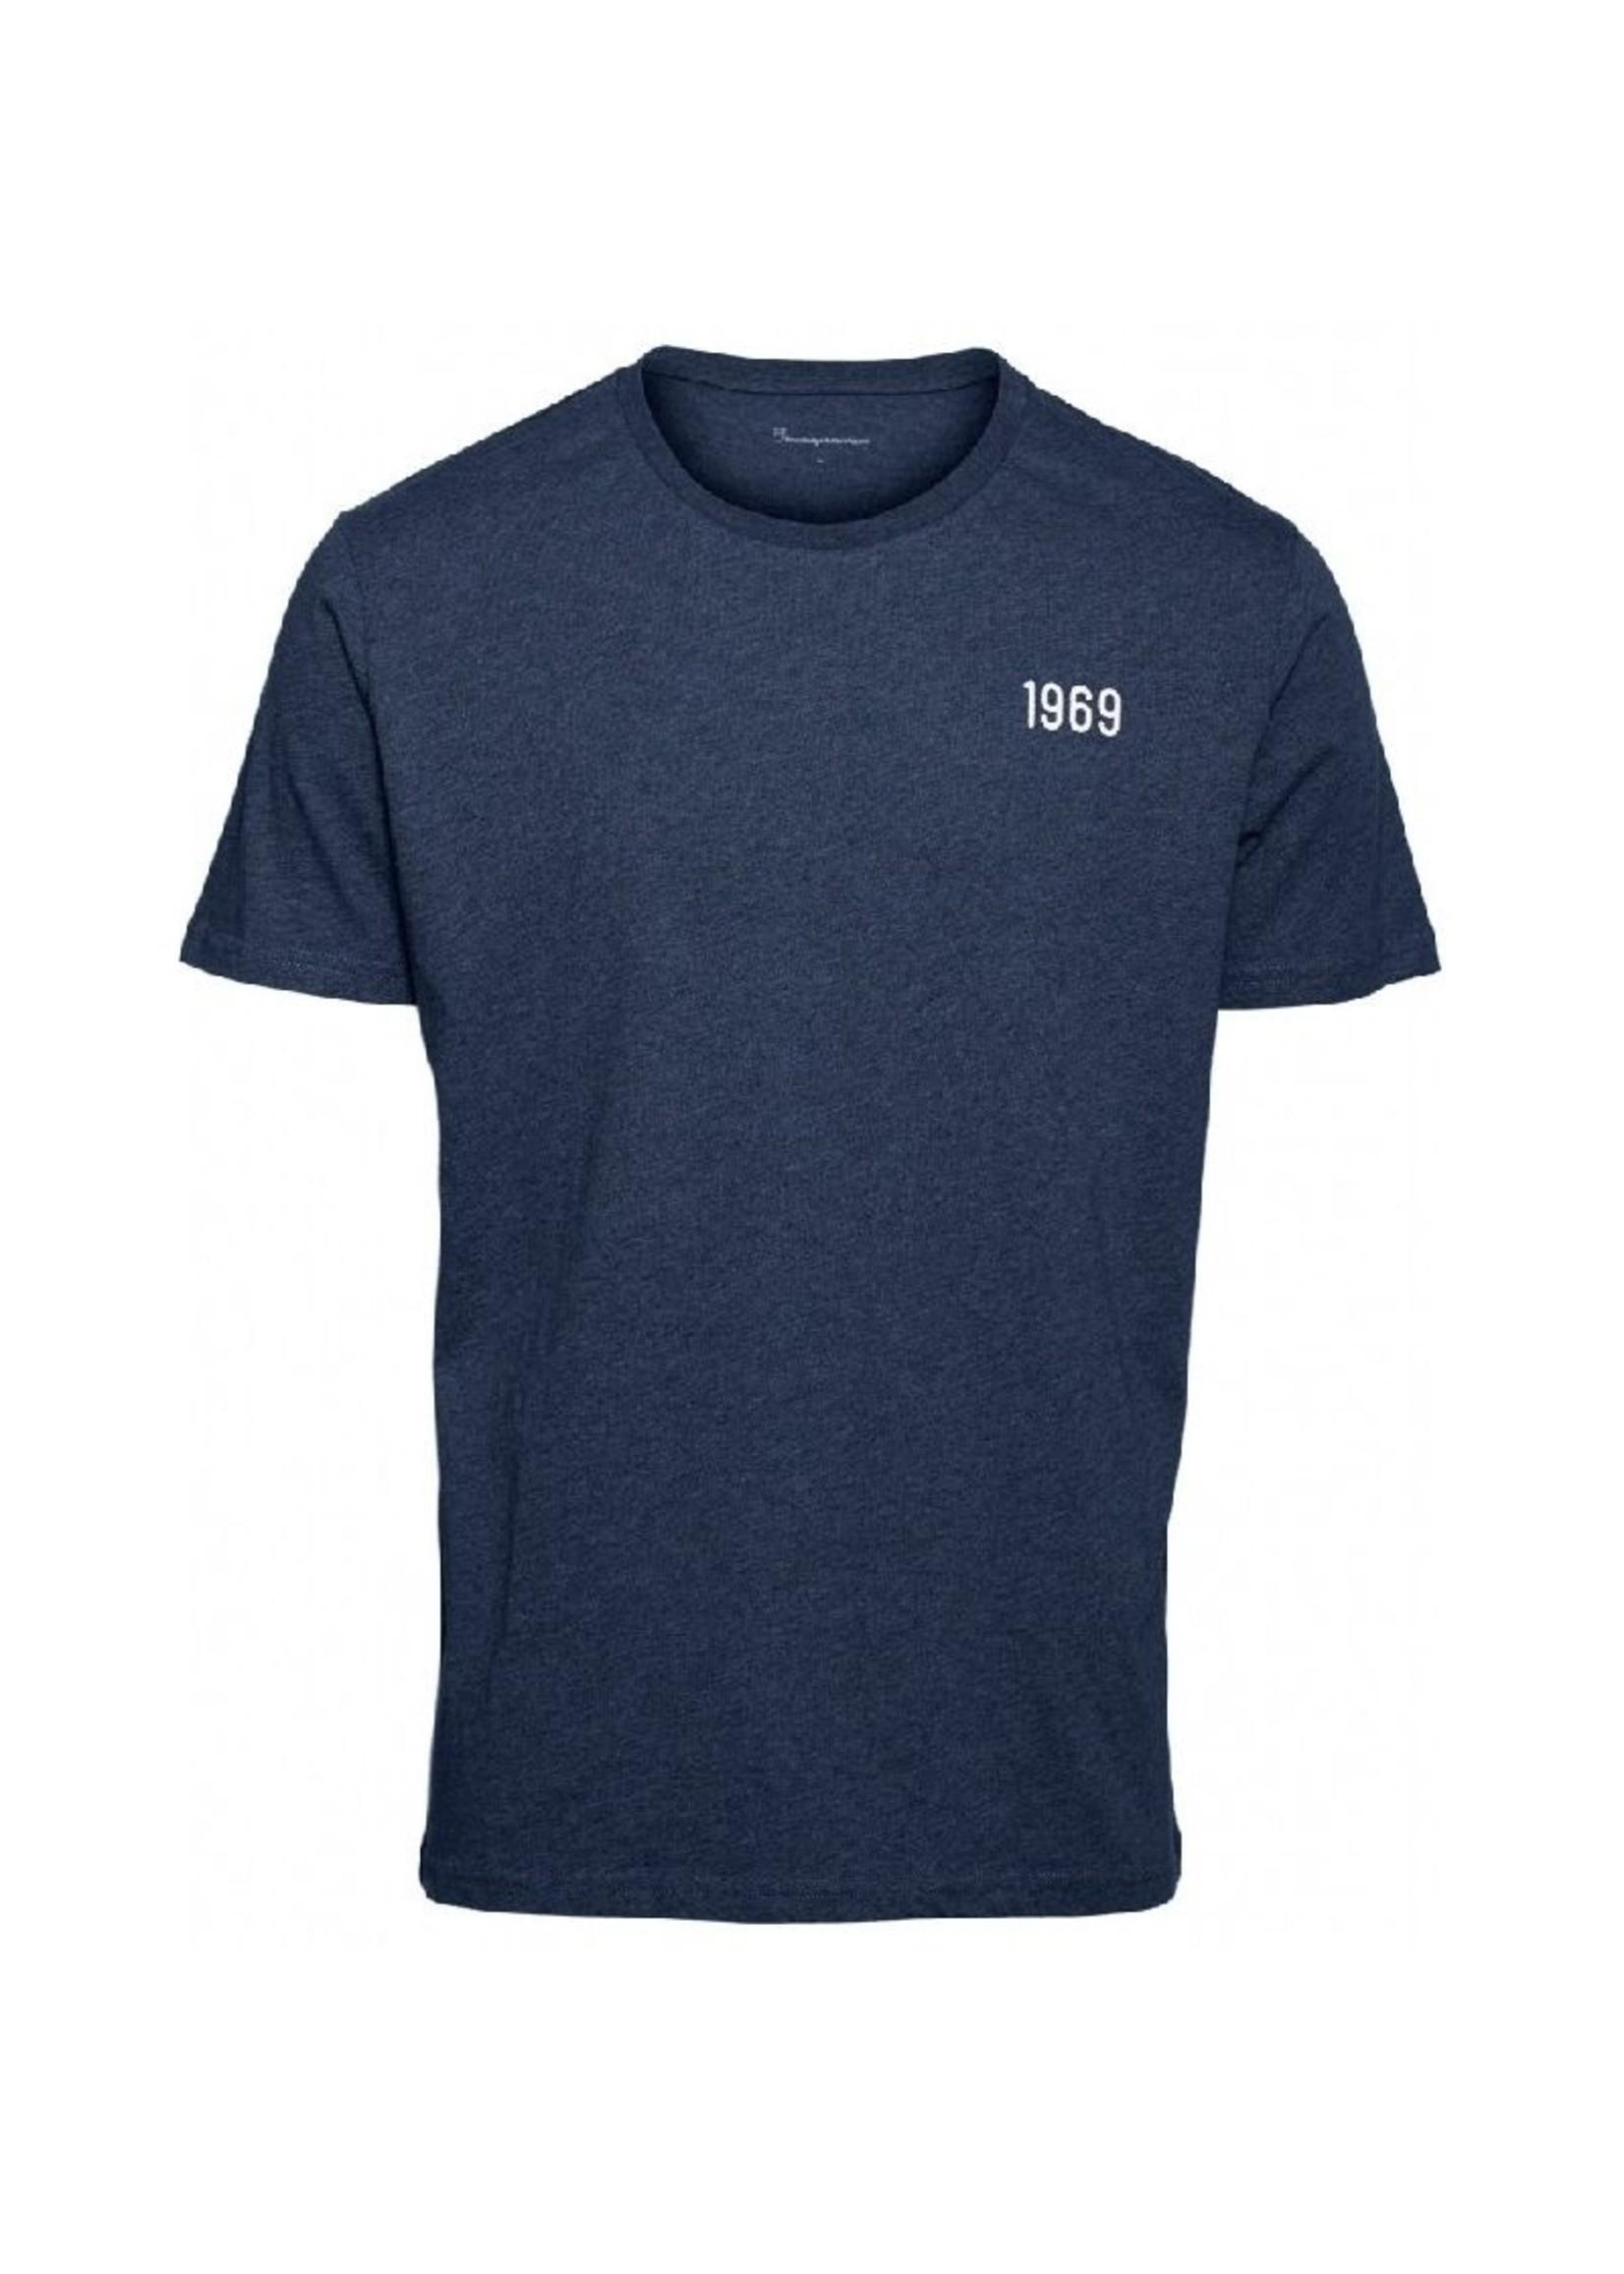 KnowledgeCotton KnowledgeCotton Alder 1969 T-shirt